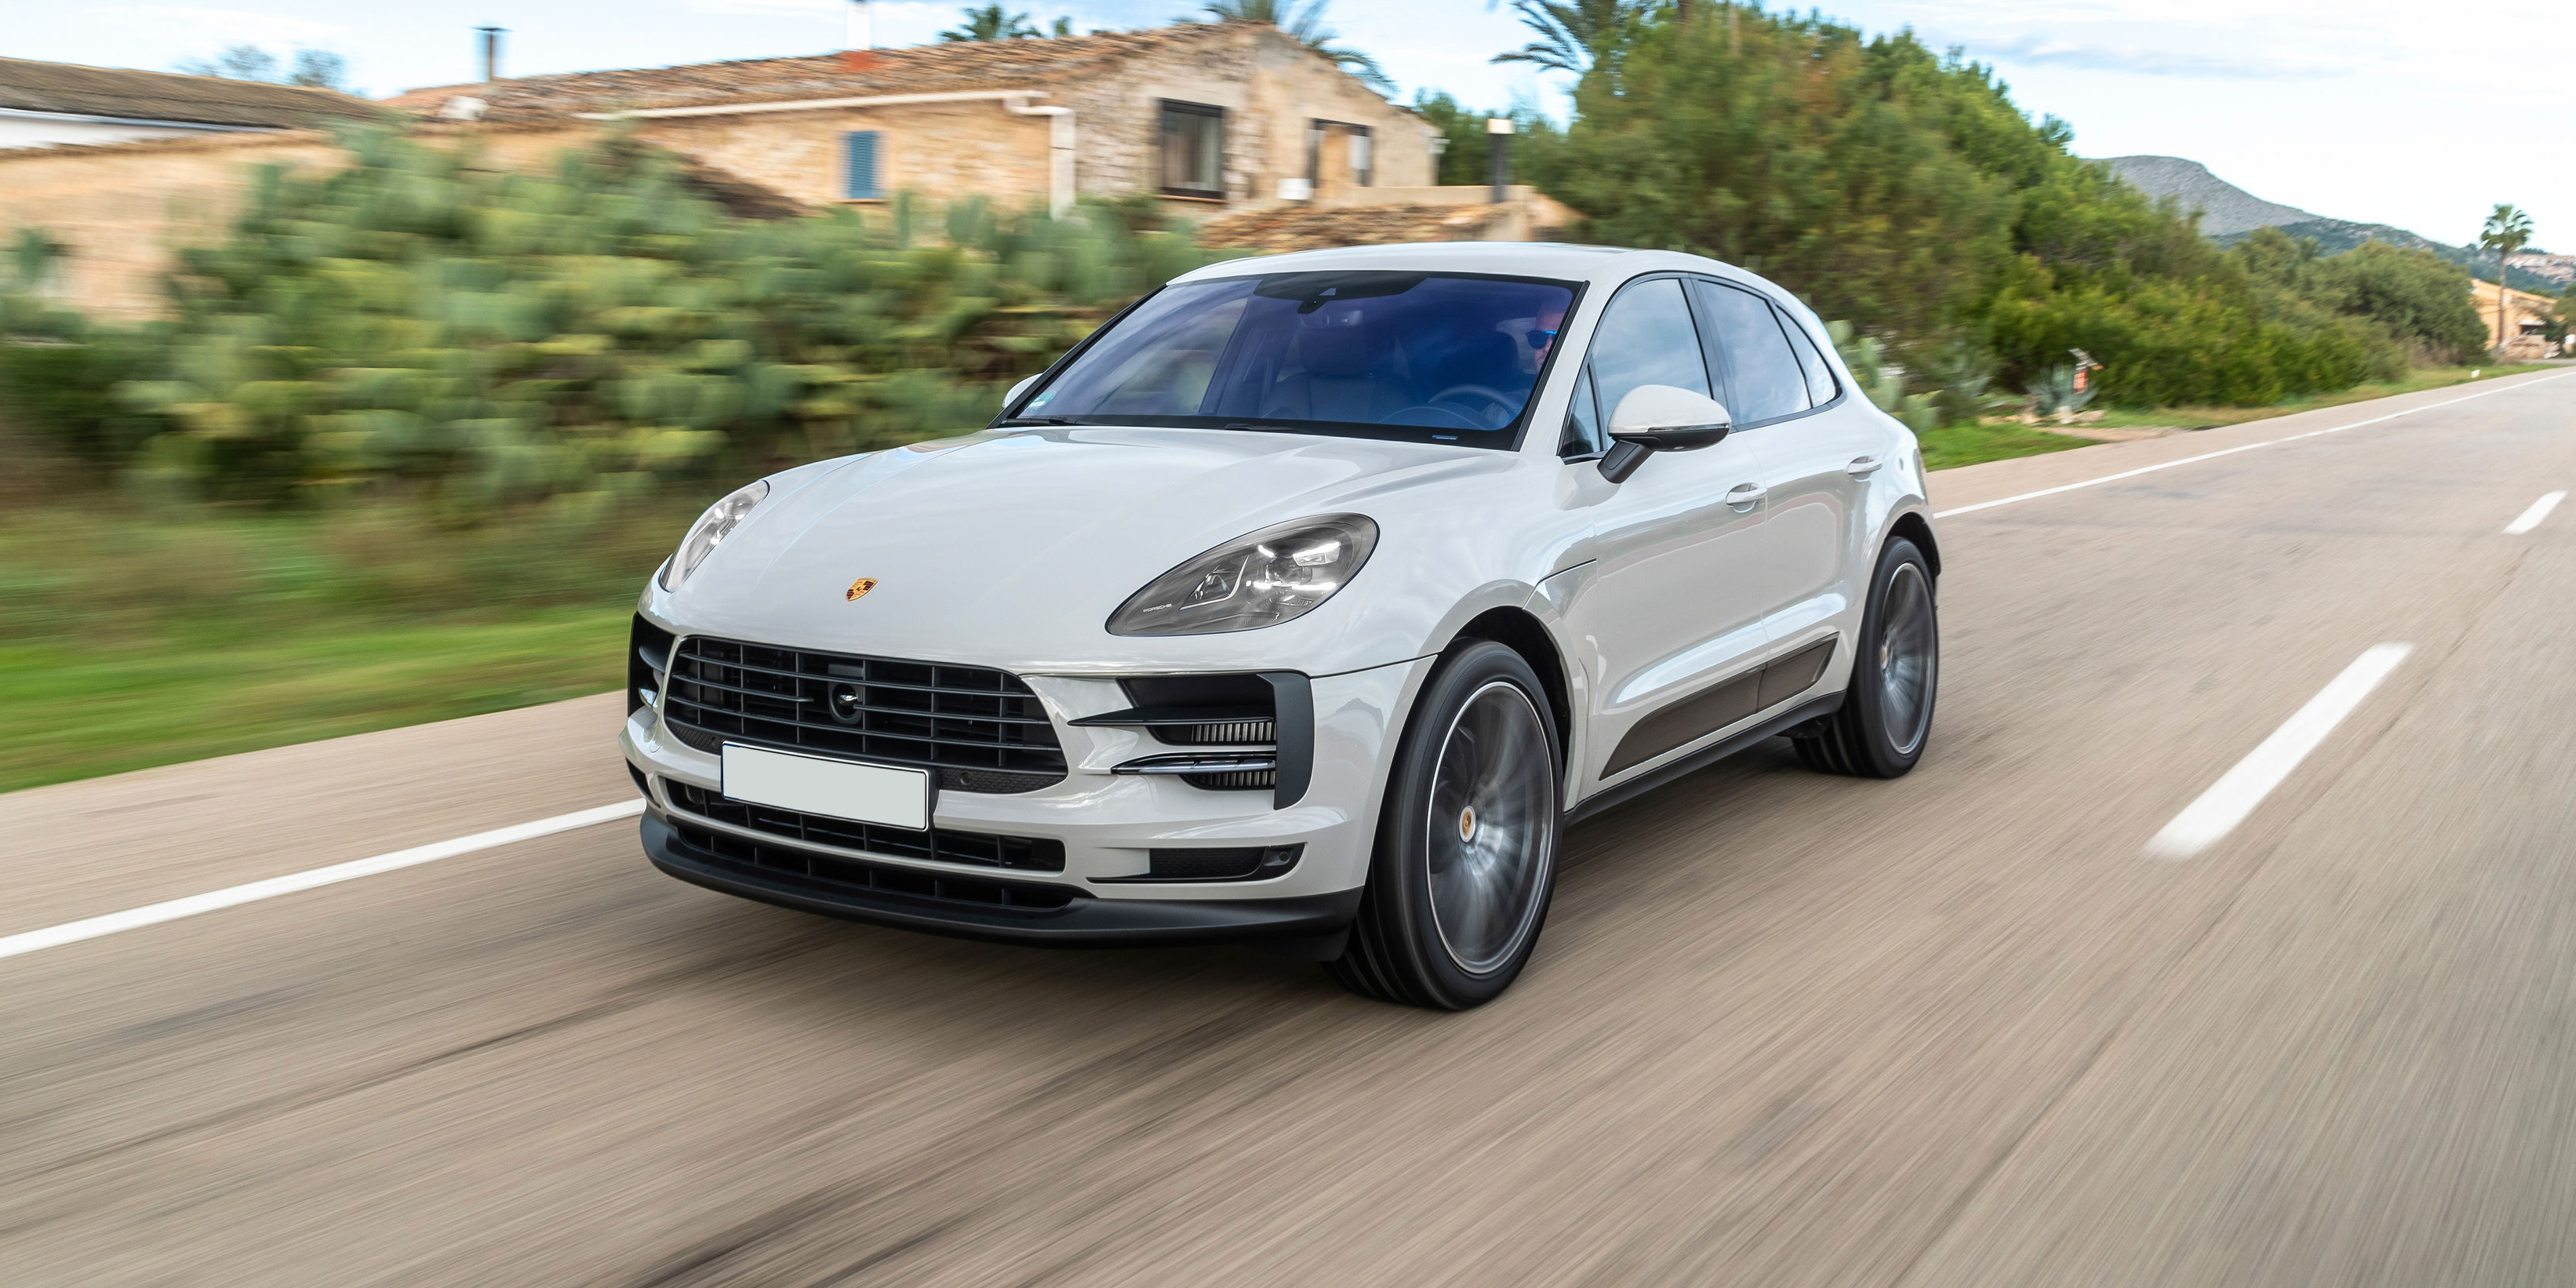 New Porsche Macan Review Carwow